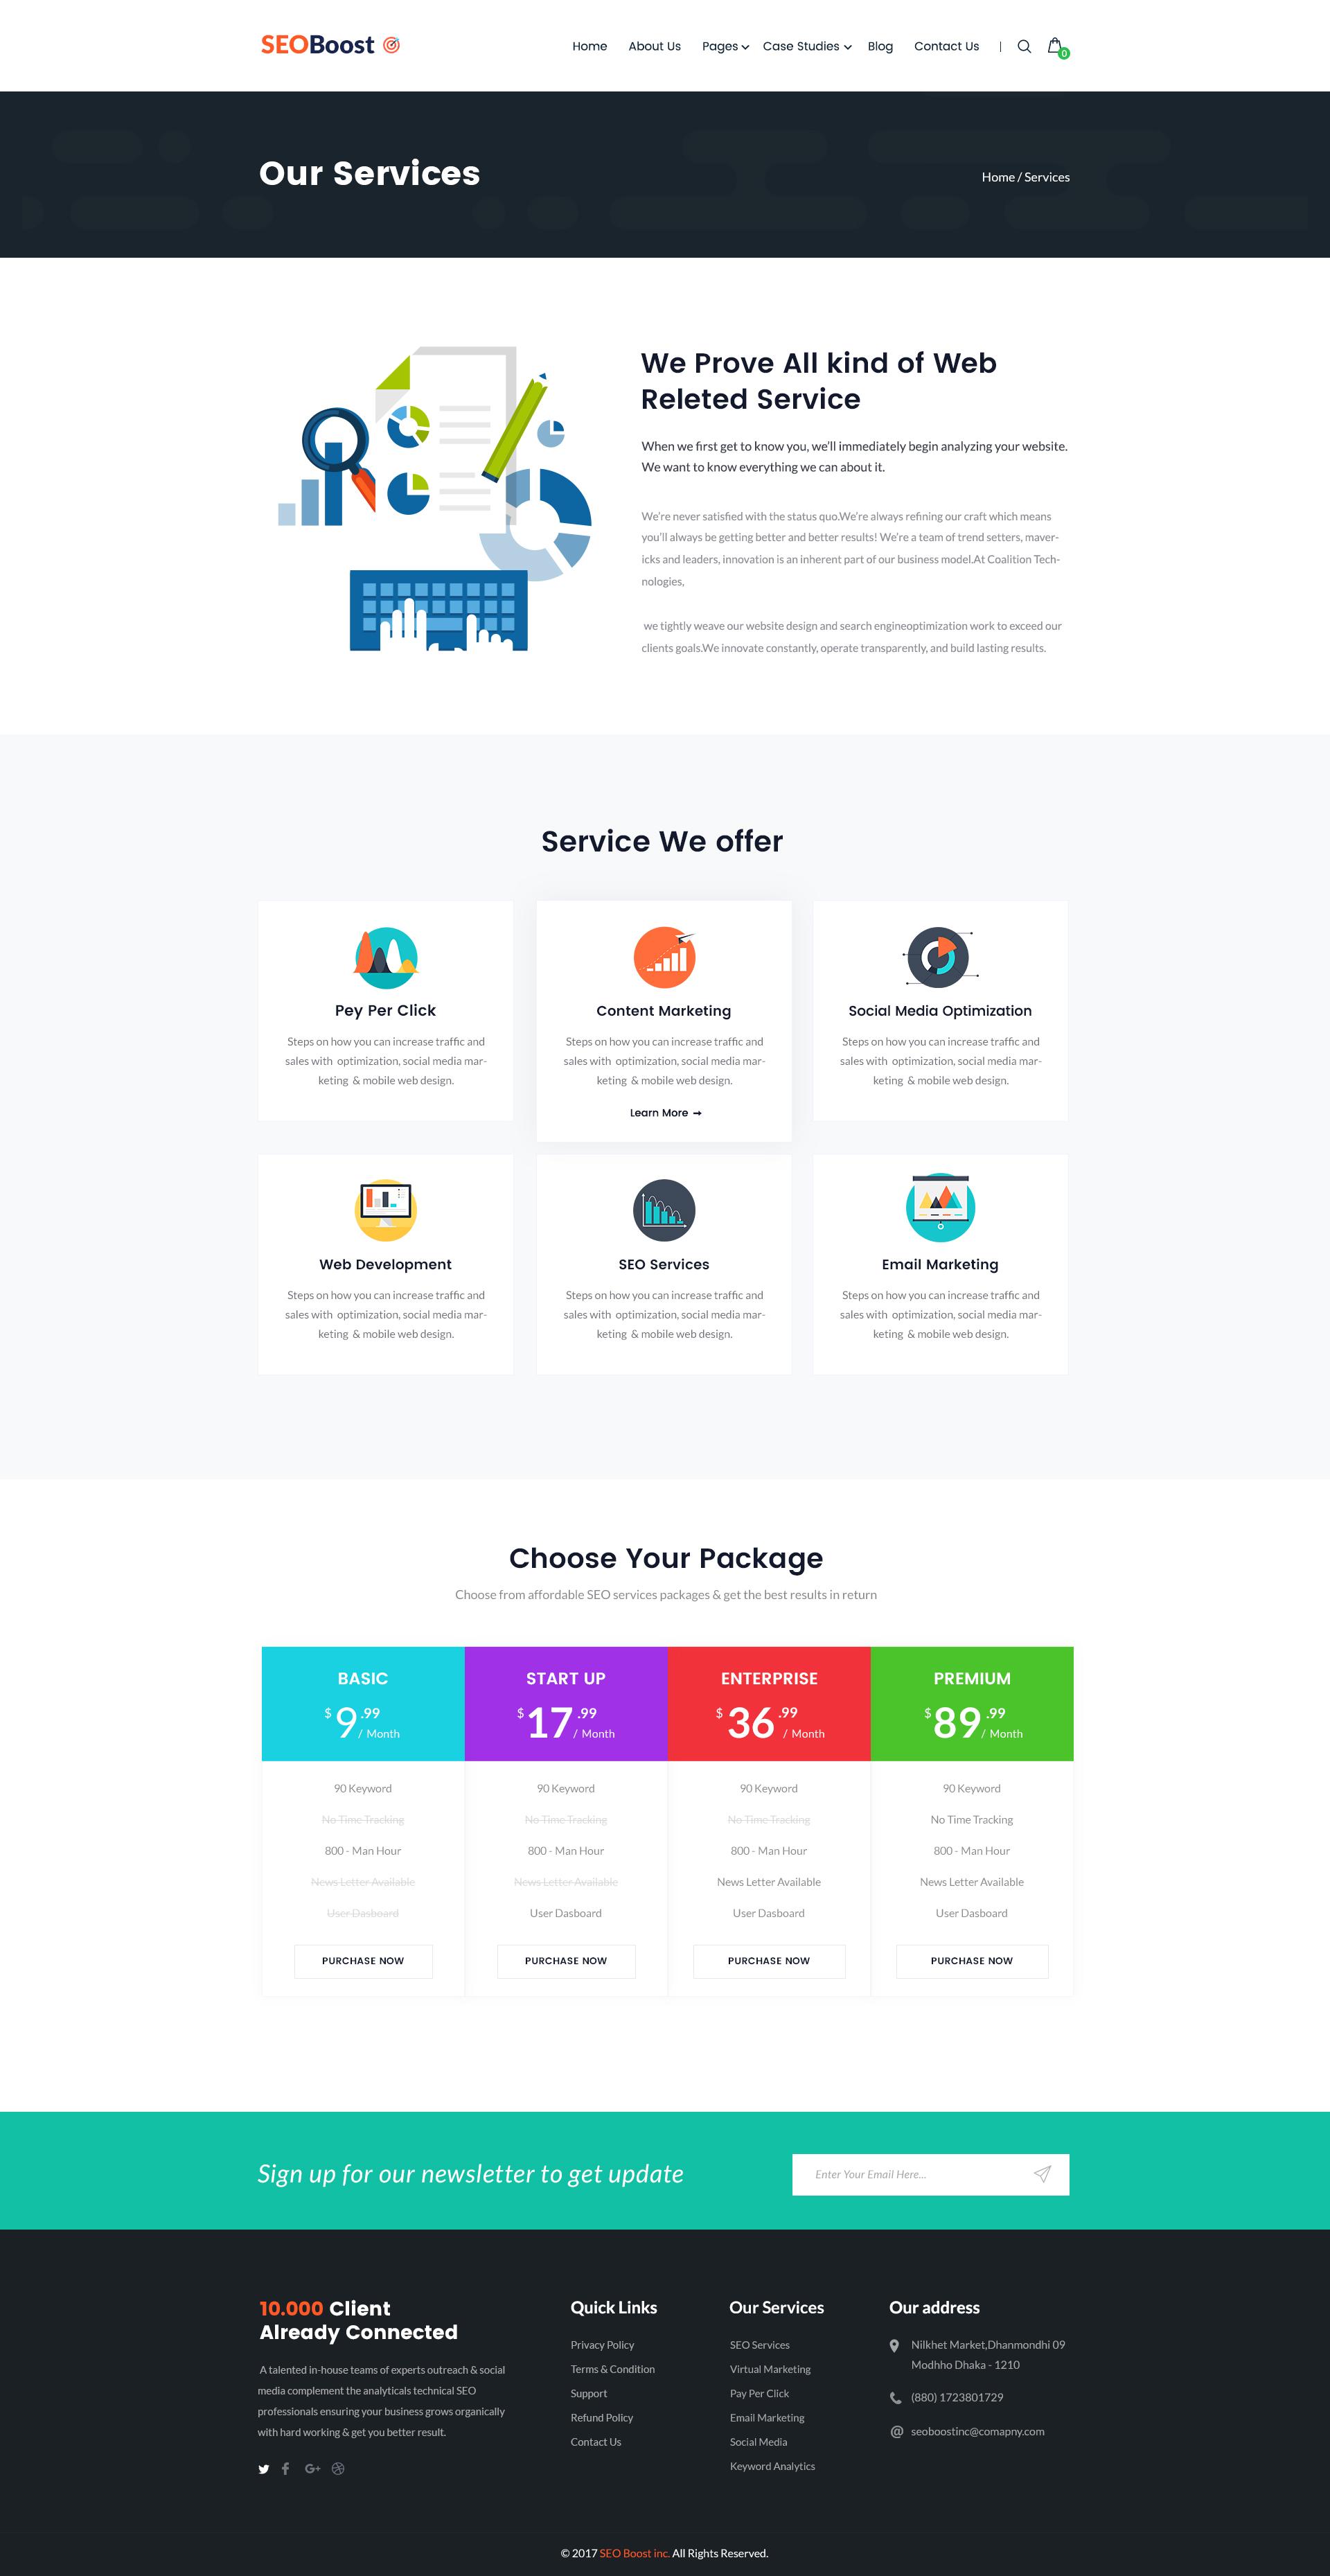 SEOBoost - SEO & Digital Marketing Agency PSD Template by CreativeGigs